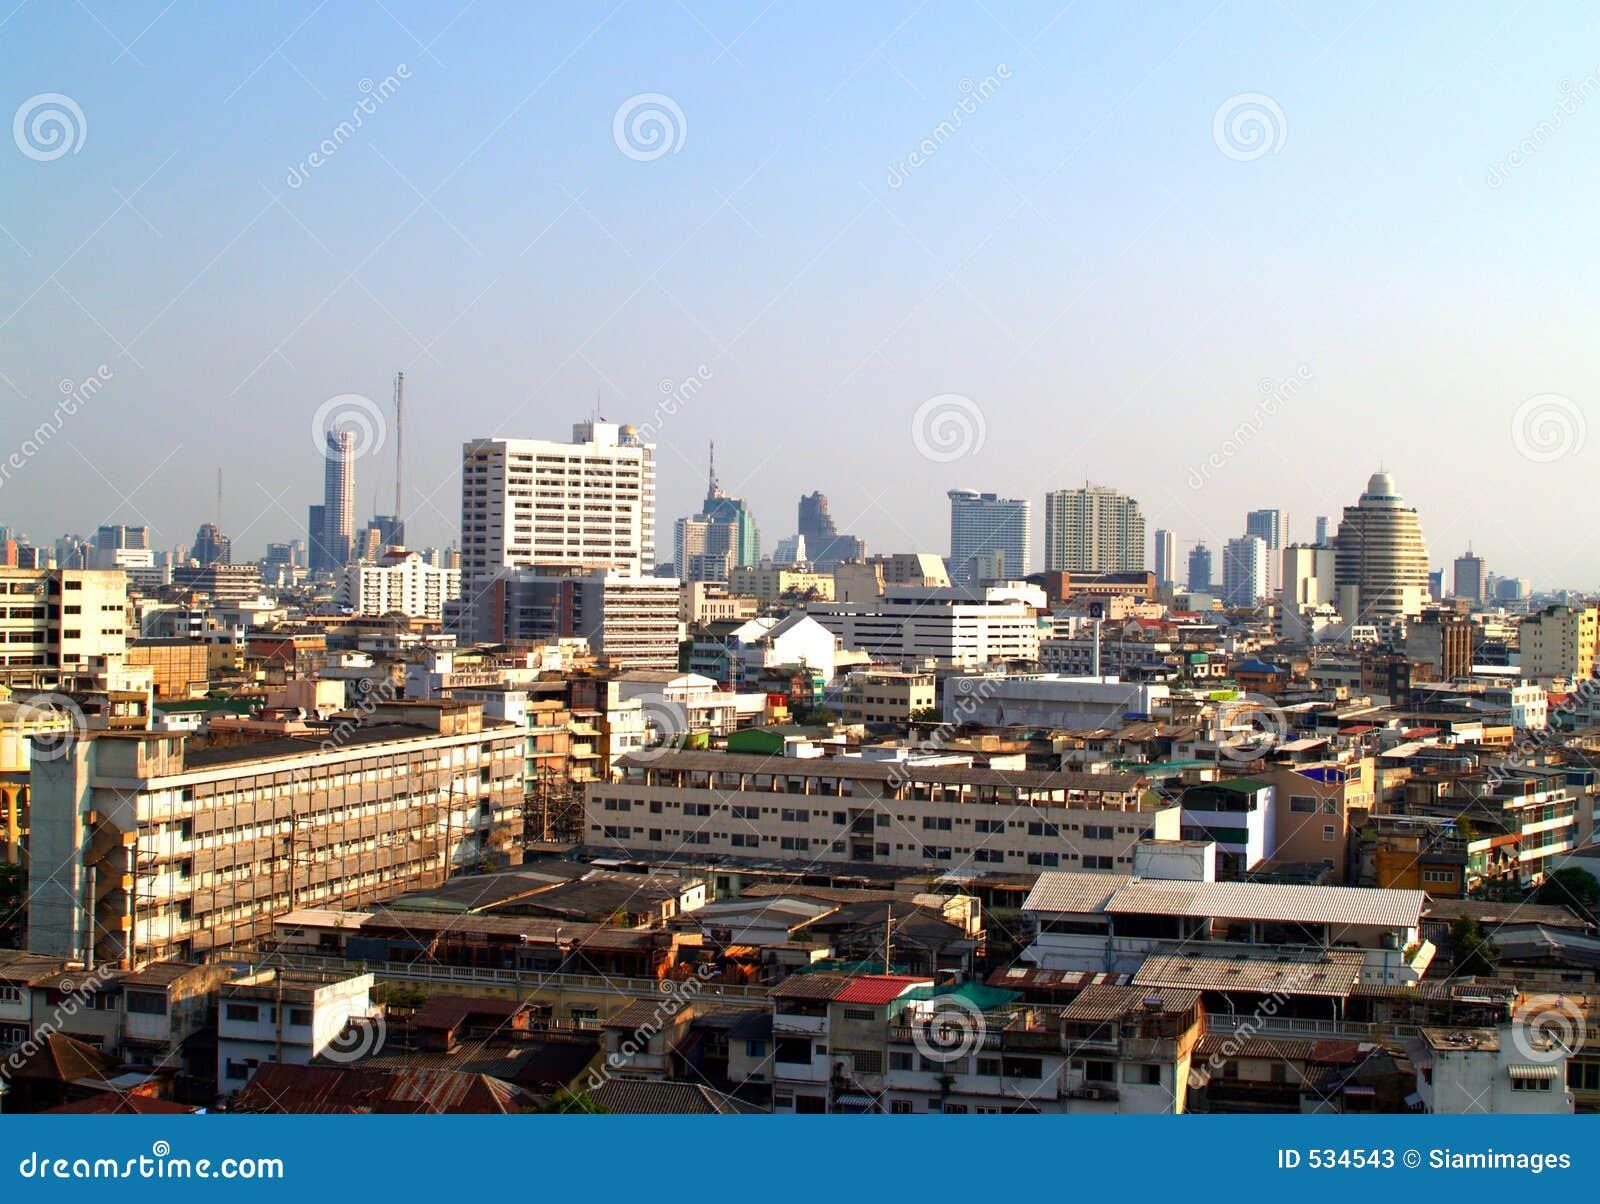 Download 曼谷视图 库存图片. 图片 包括有 摩天大楼, 拱道, 资本, 运输, 城市, 地平线, 轰隆的, 天空, 视图 - 534543